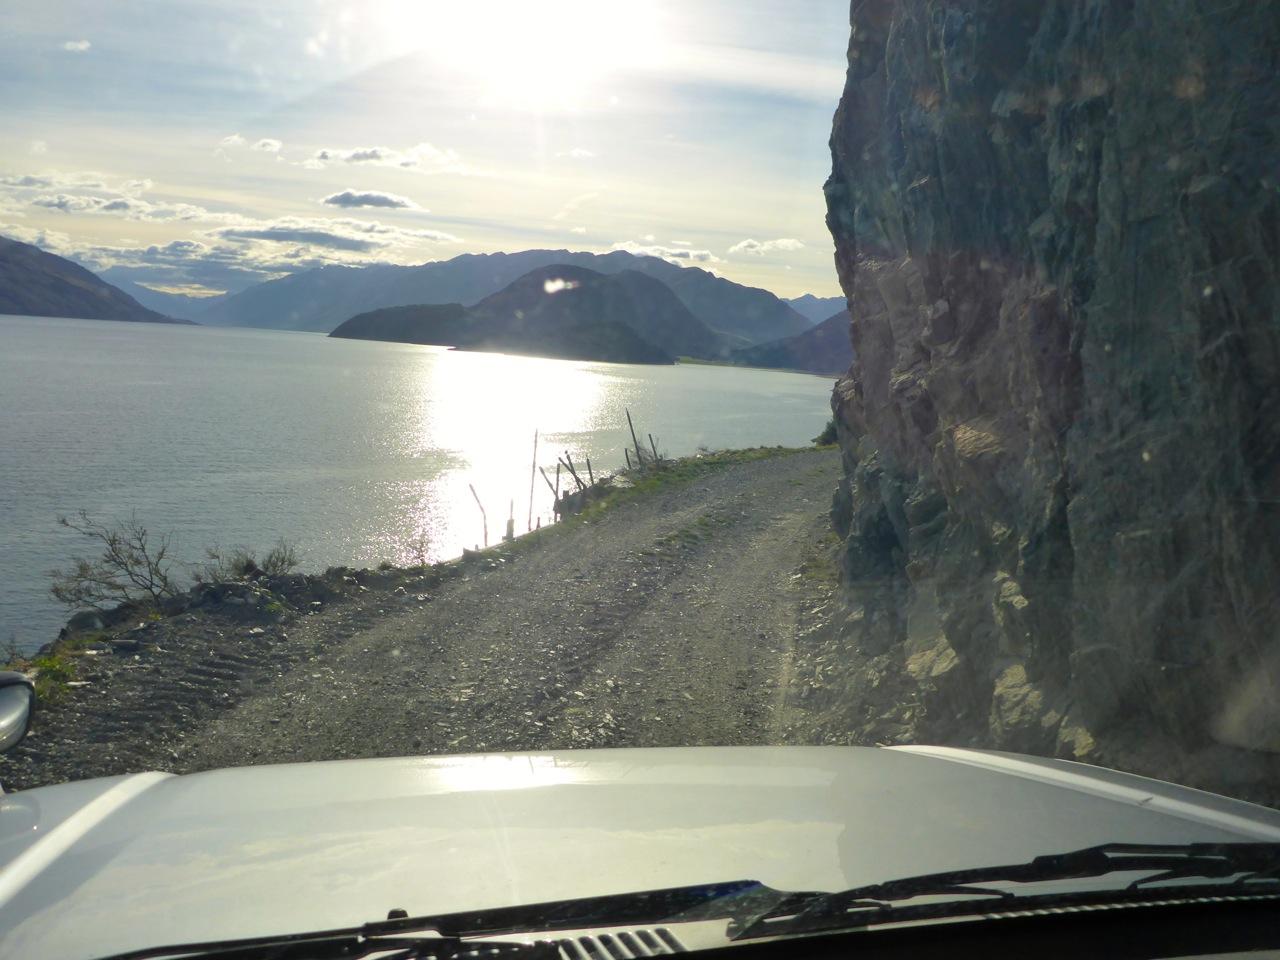 Sheer cliffs on the left!